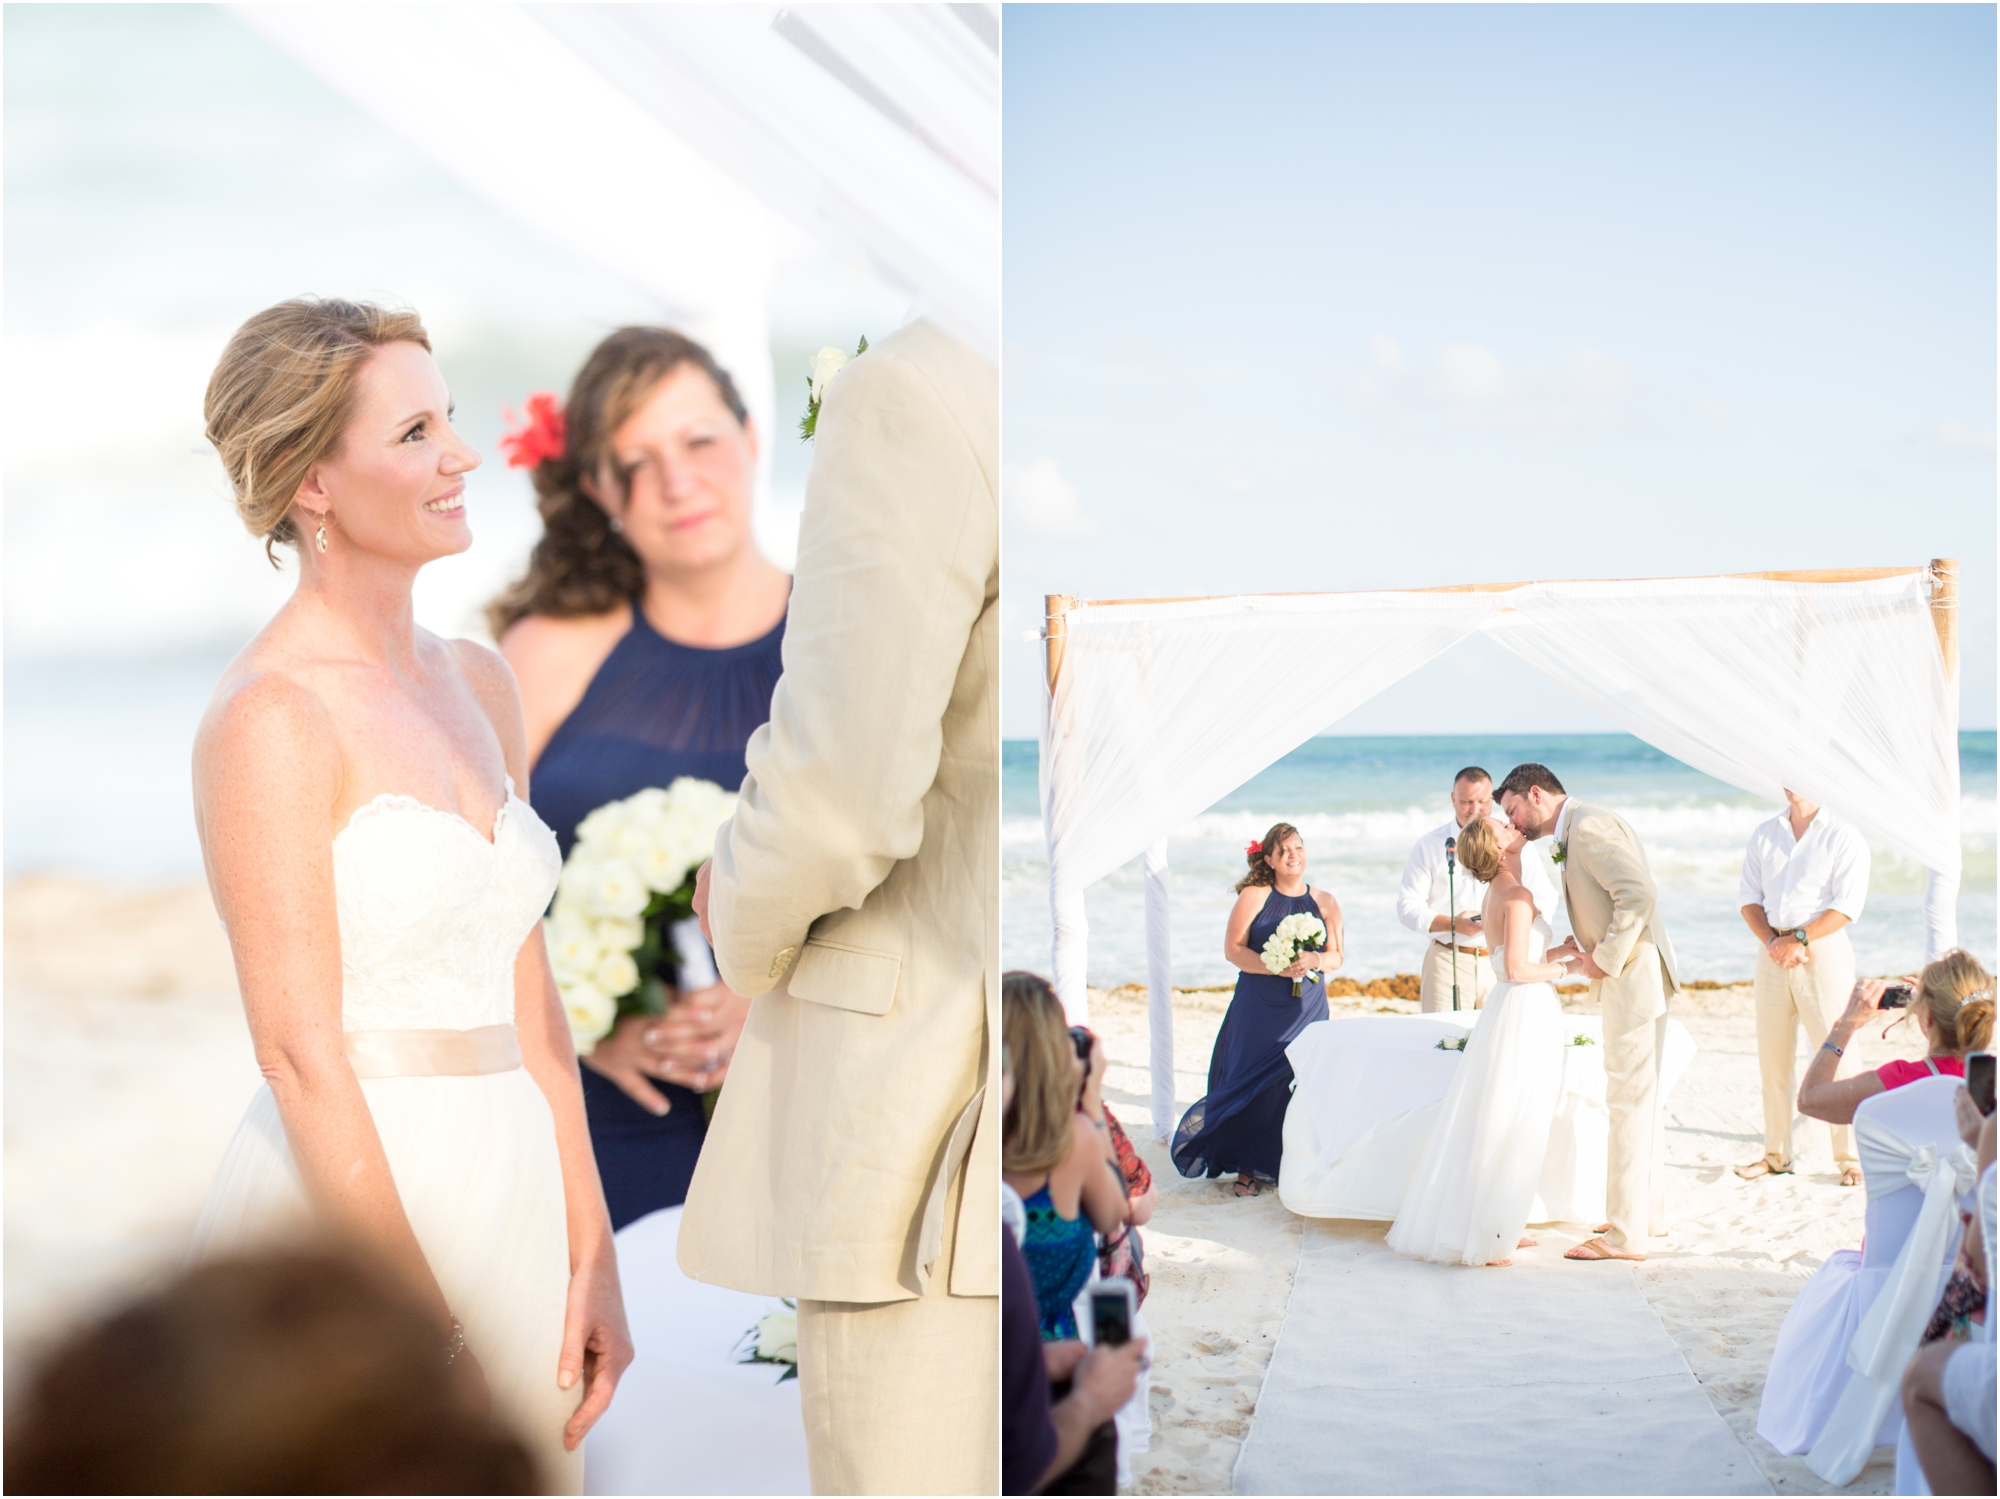 Morosoff Wedding 2-Ceremony-214_anna grace photography destination wedding photographer playa del carmen mexico photo.jpg